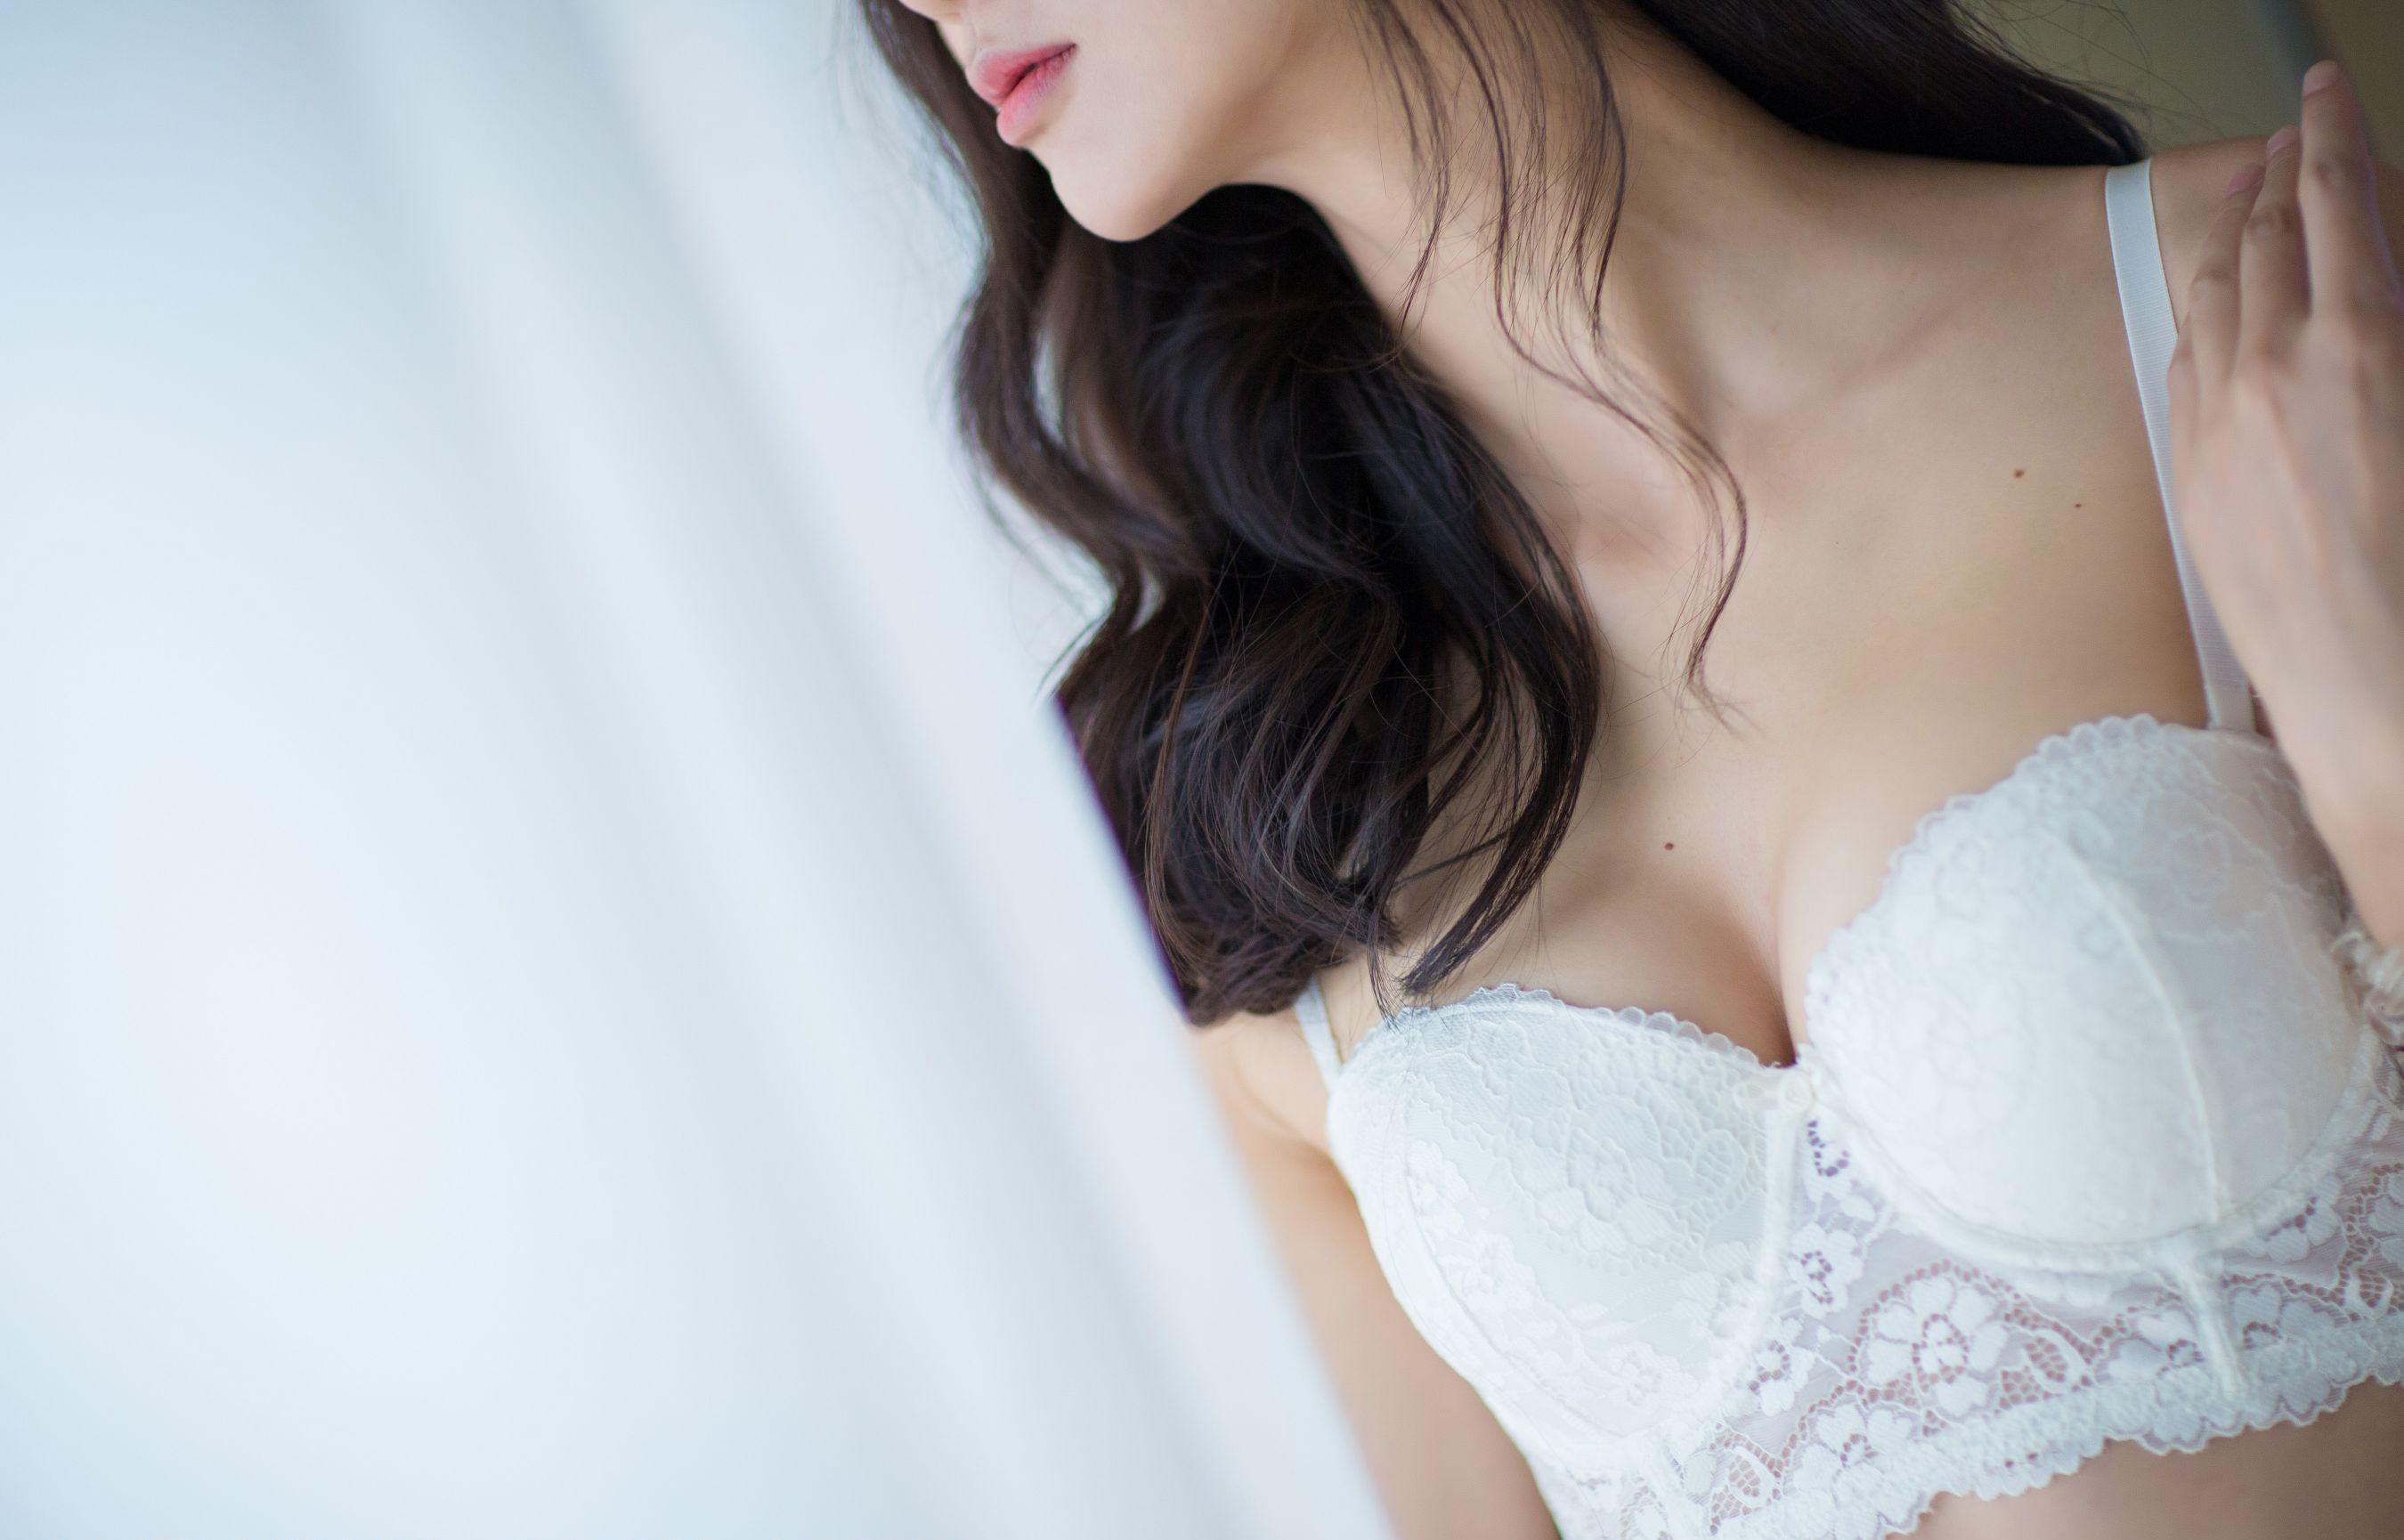 4SOE-939野性十足的短发纹身美女